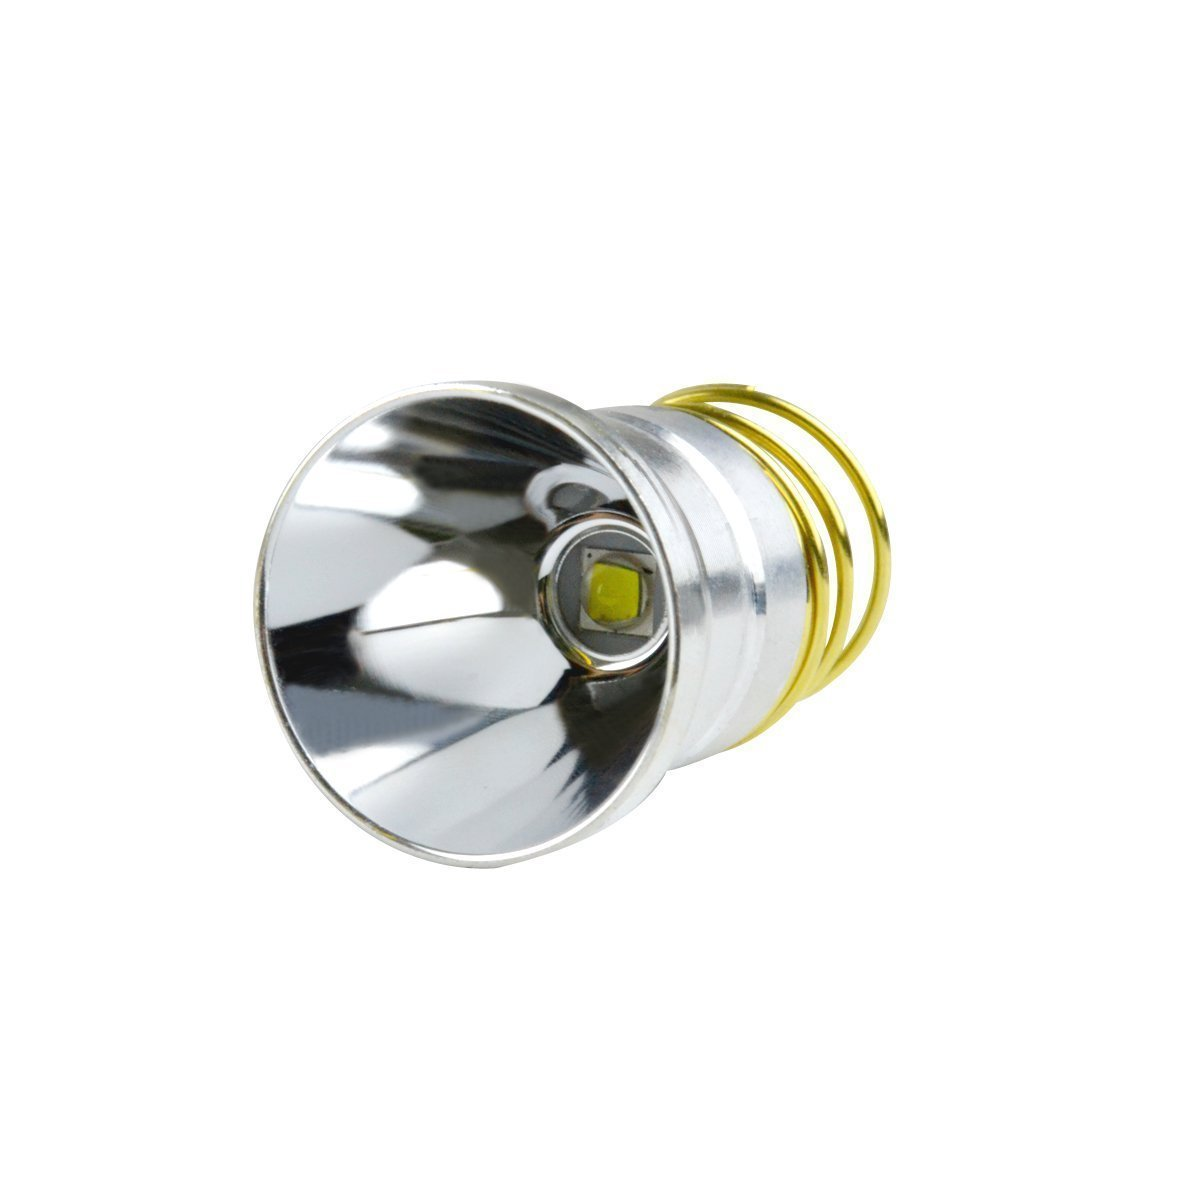 BESTSUN Ultra Bright New Cree XM-L2 LED Bulb 1 Mode 1200Lumens Drop-in P60 Design Module Flashlight Repair Parts Torch Replacement Bulb for Surefire Hugsby C2 G2 Z2 6P 9P G3 S3 D2 Ultrafire 501B 502B by BESTSUN